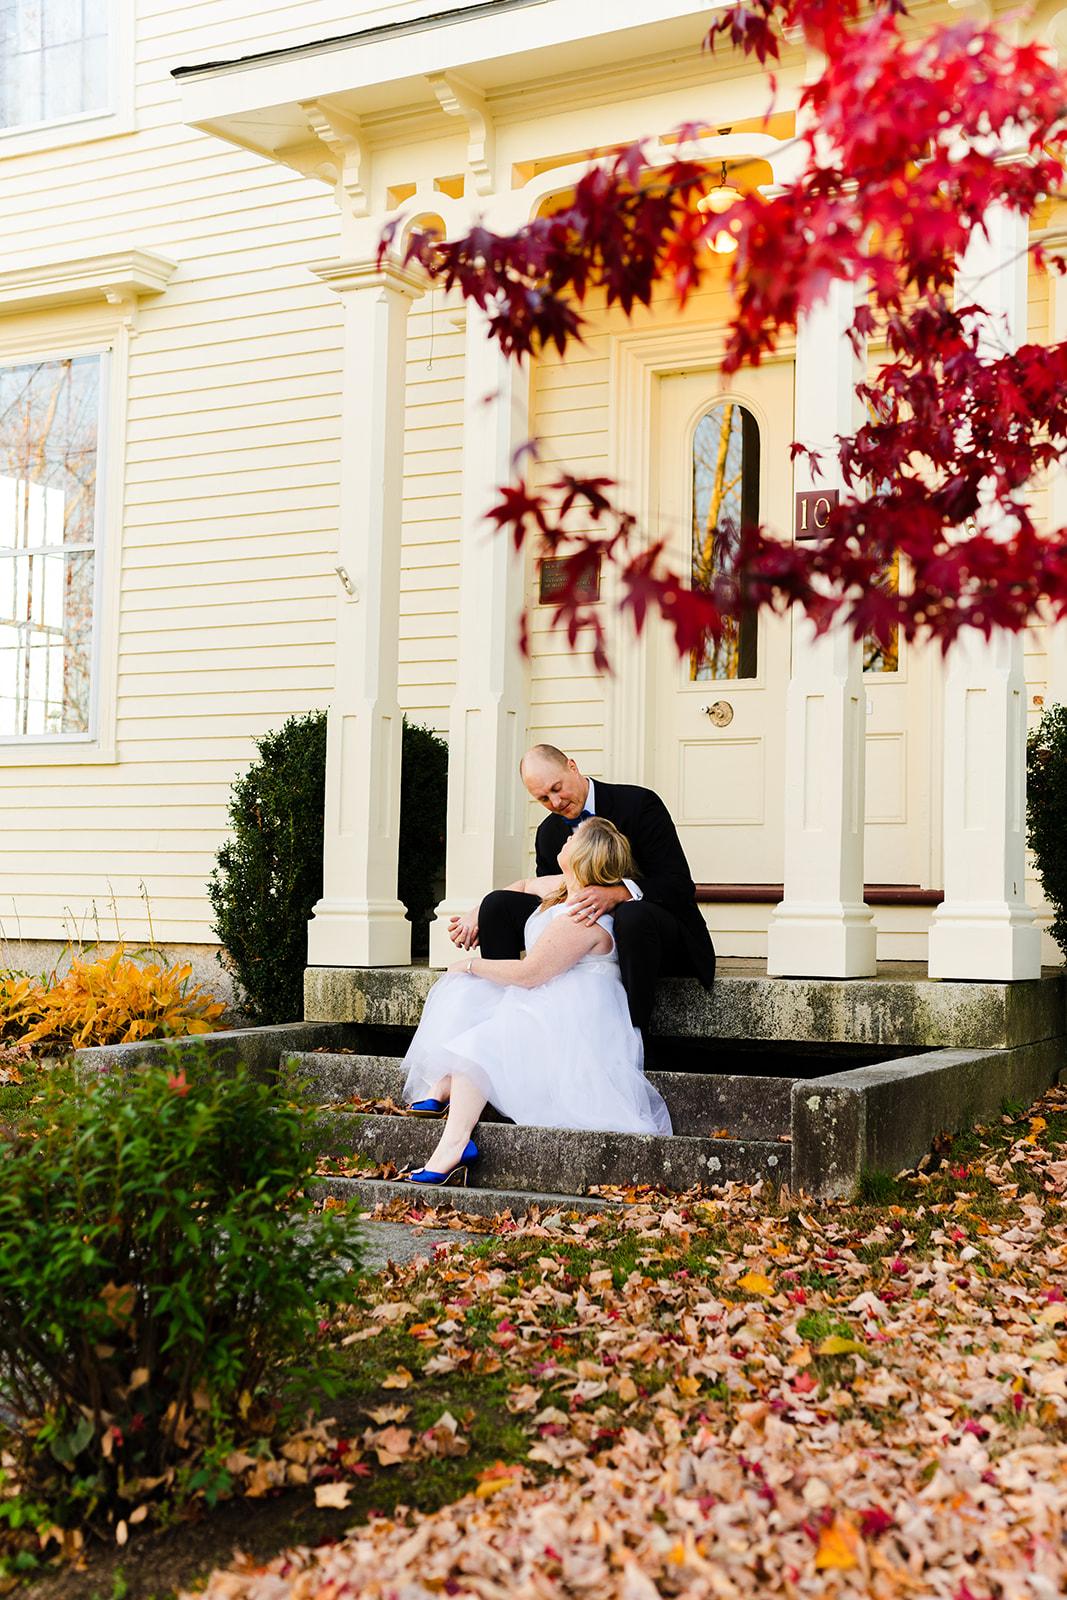 Stockton Springs Maine Hichborn Intimate Elopement 51